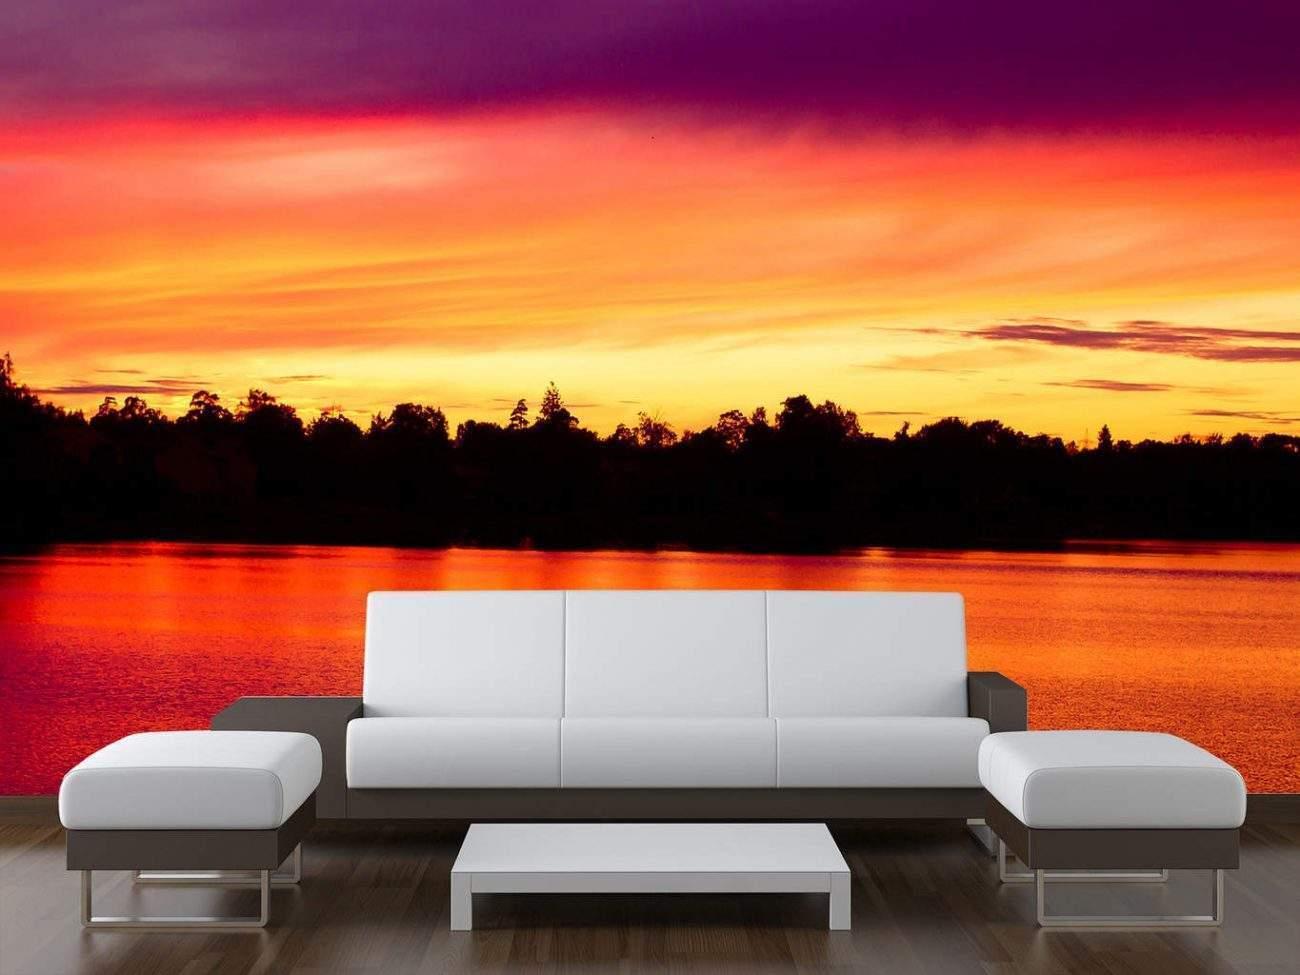 Lake Sunset wall Mural